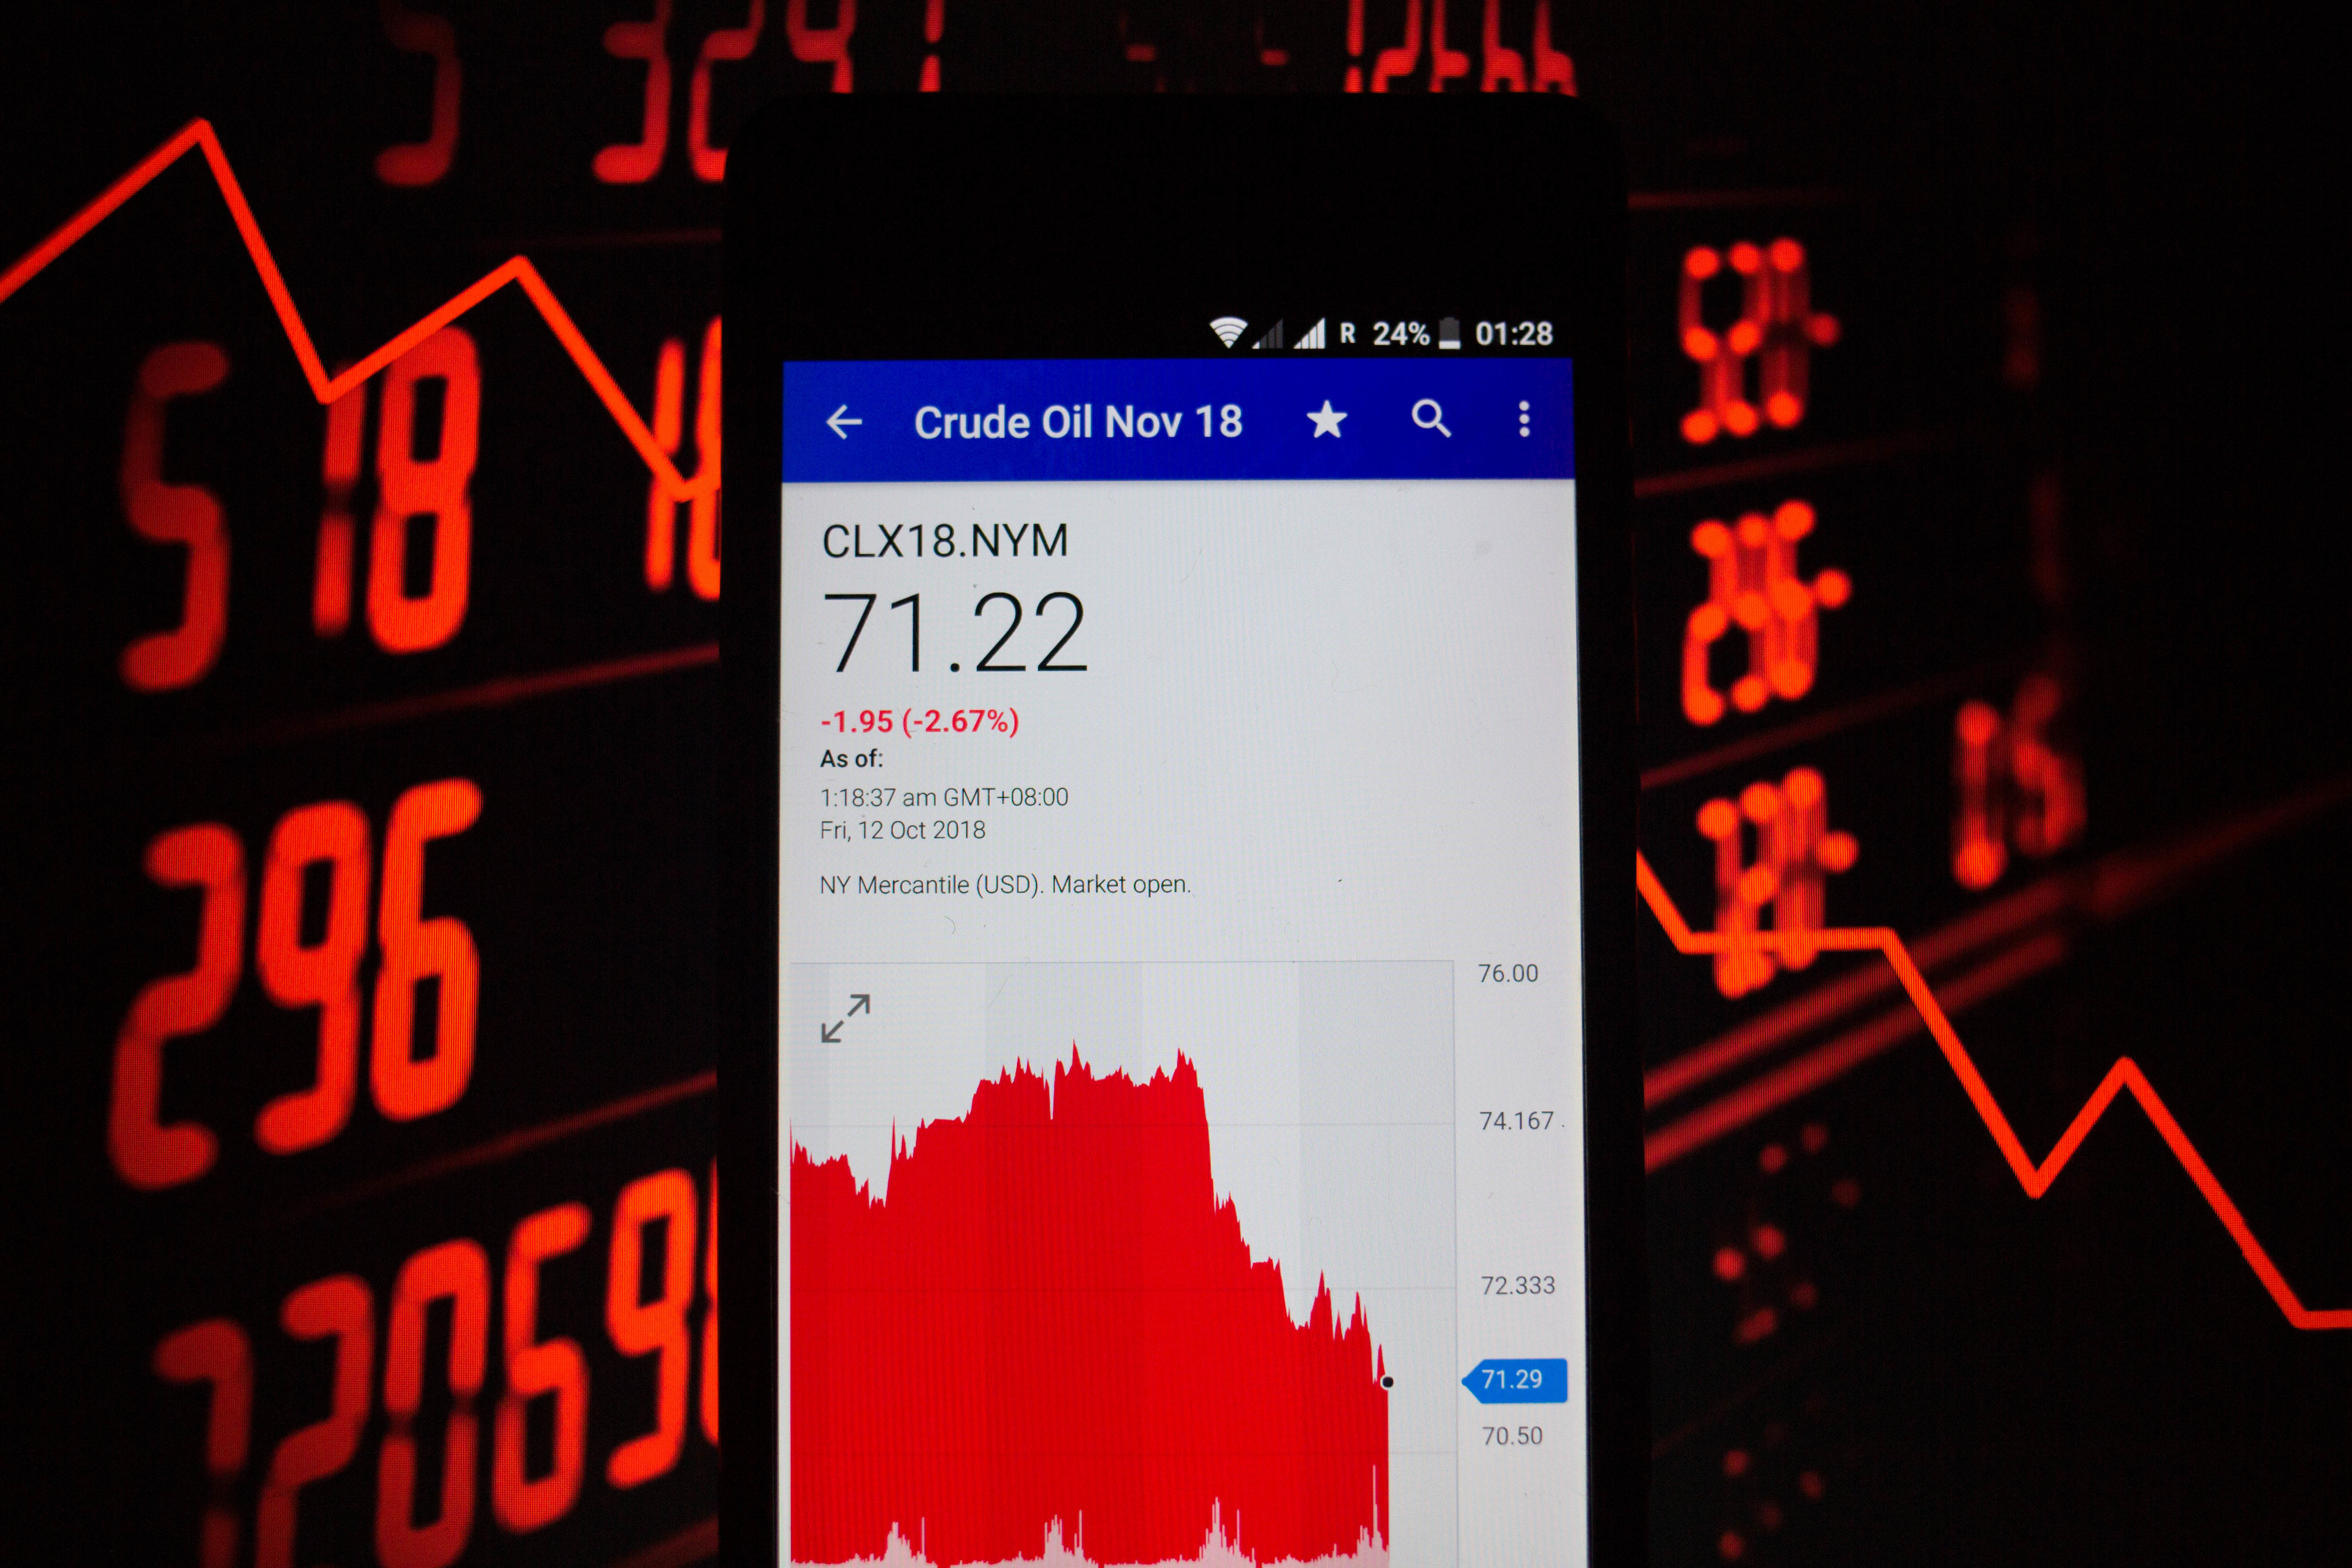 A smartphone displays the Crude Oil Nov 18 market value on